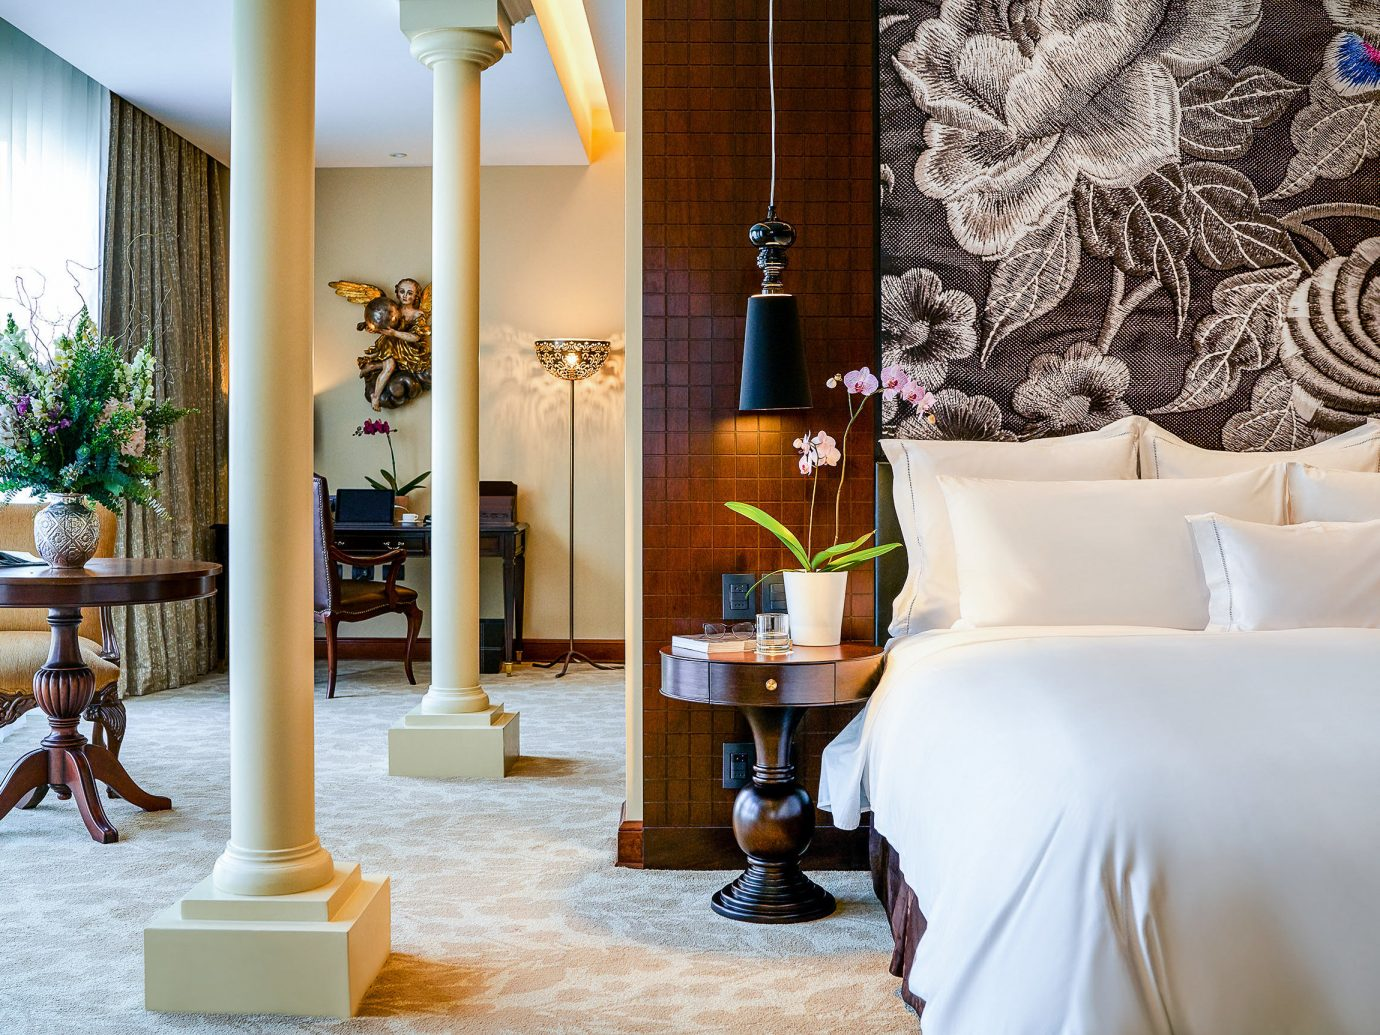 Hotels Romance indoor room interior design home furniture Suite living room window flooring ceiling decorated